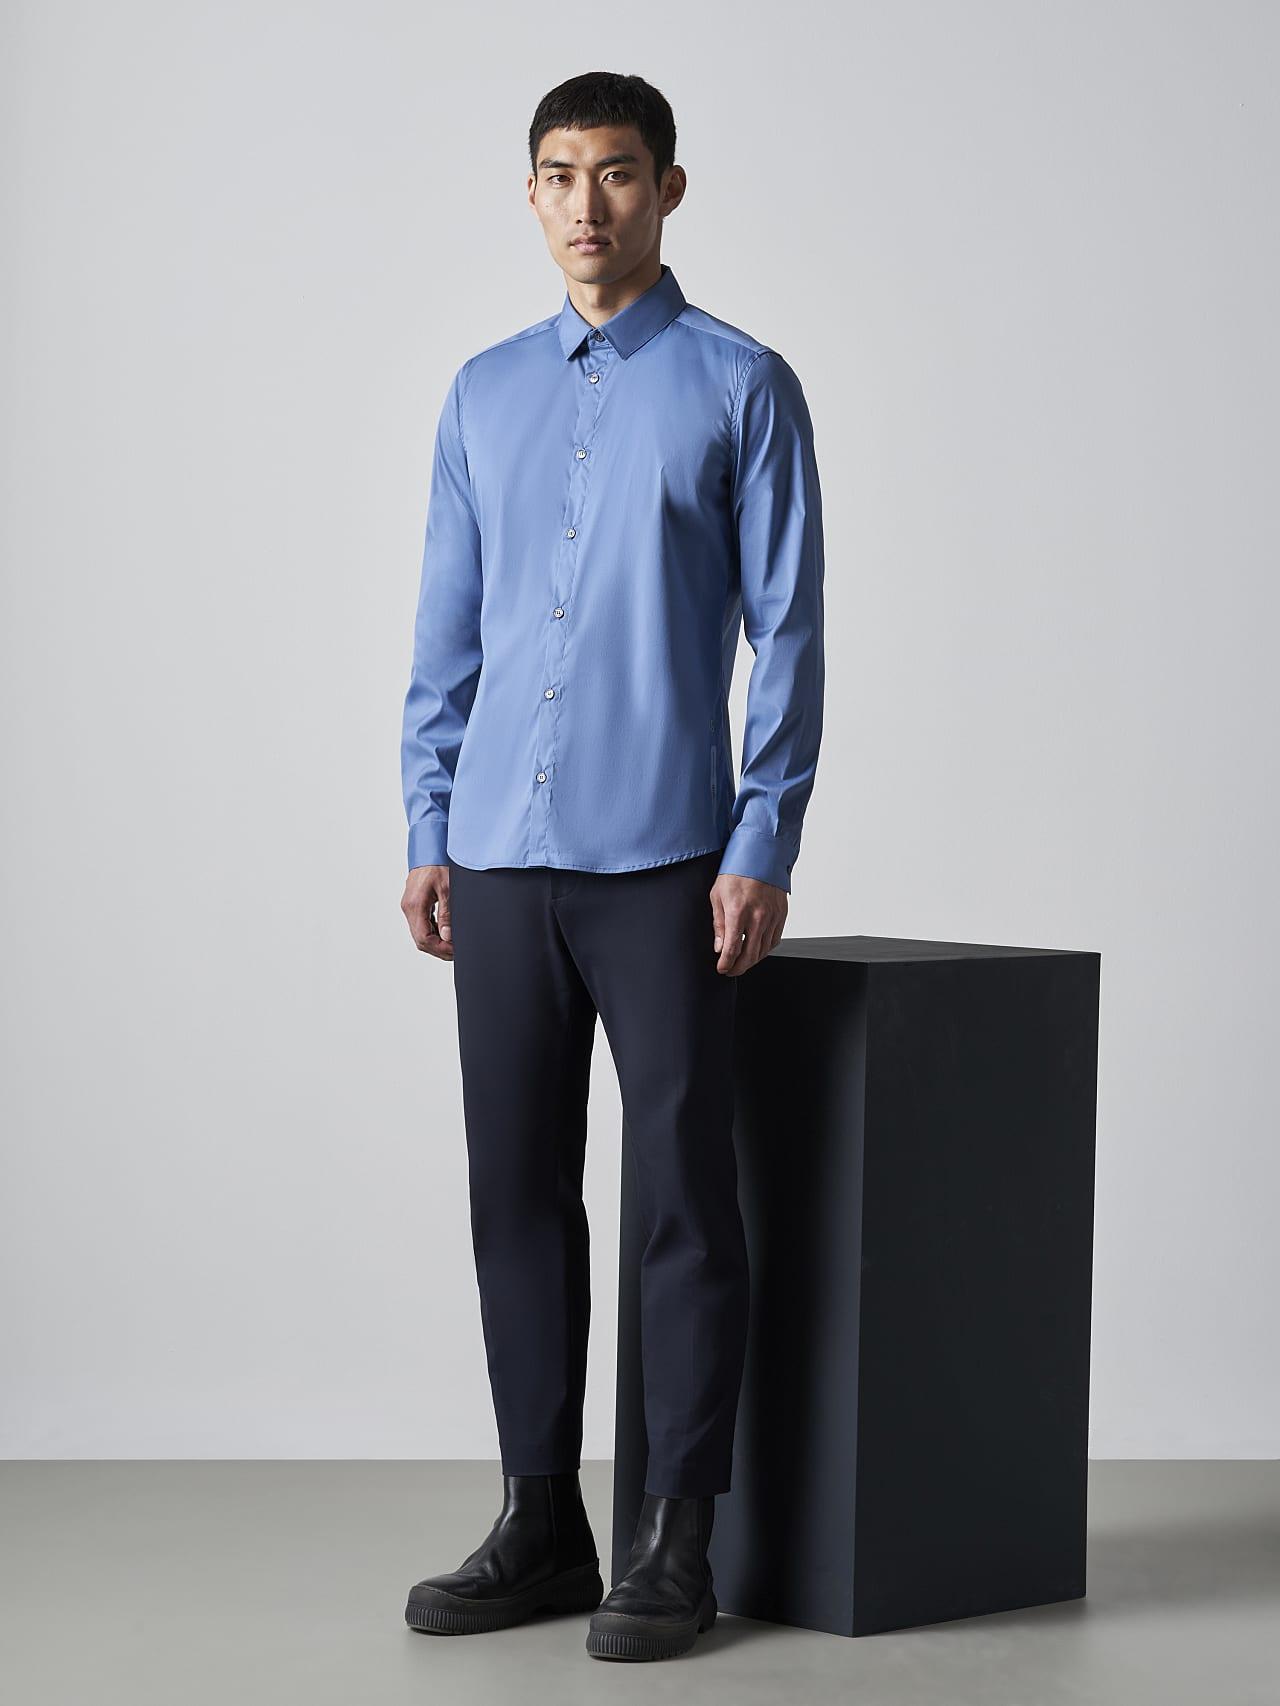 WAARG V2.Y5.02 Easy-Care Cotton Shirt light blue Model shot Alpha Tauri